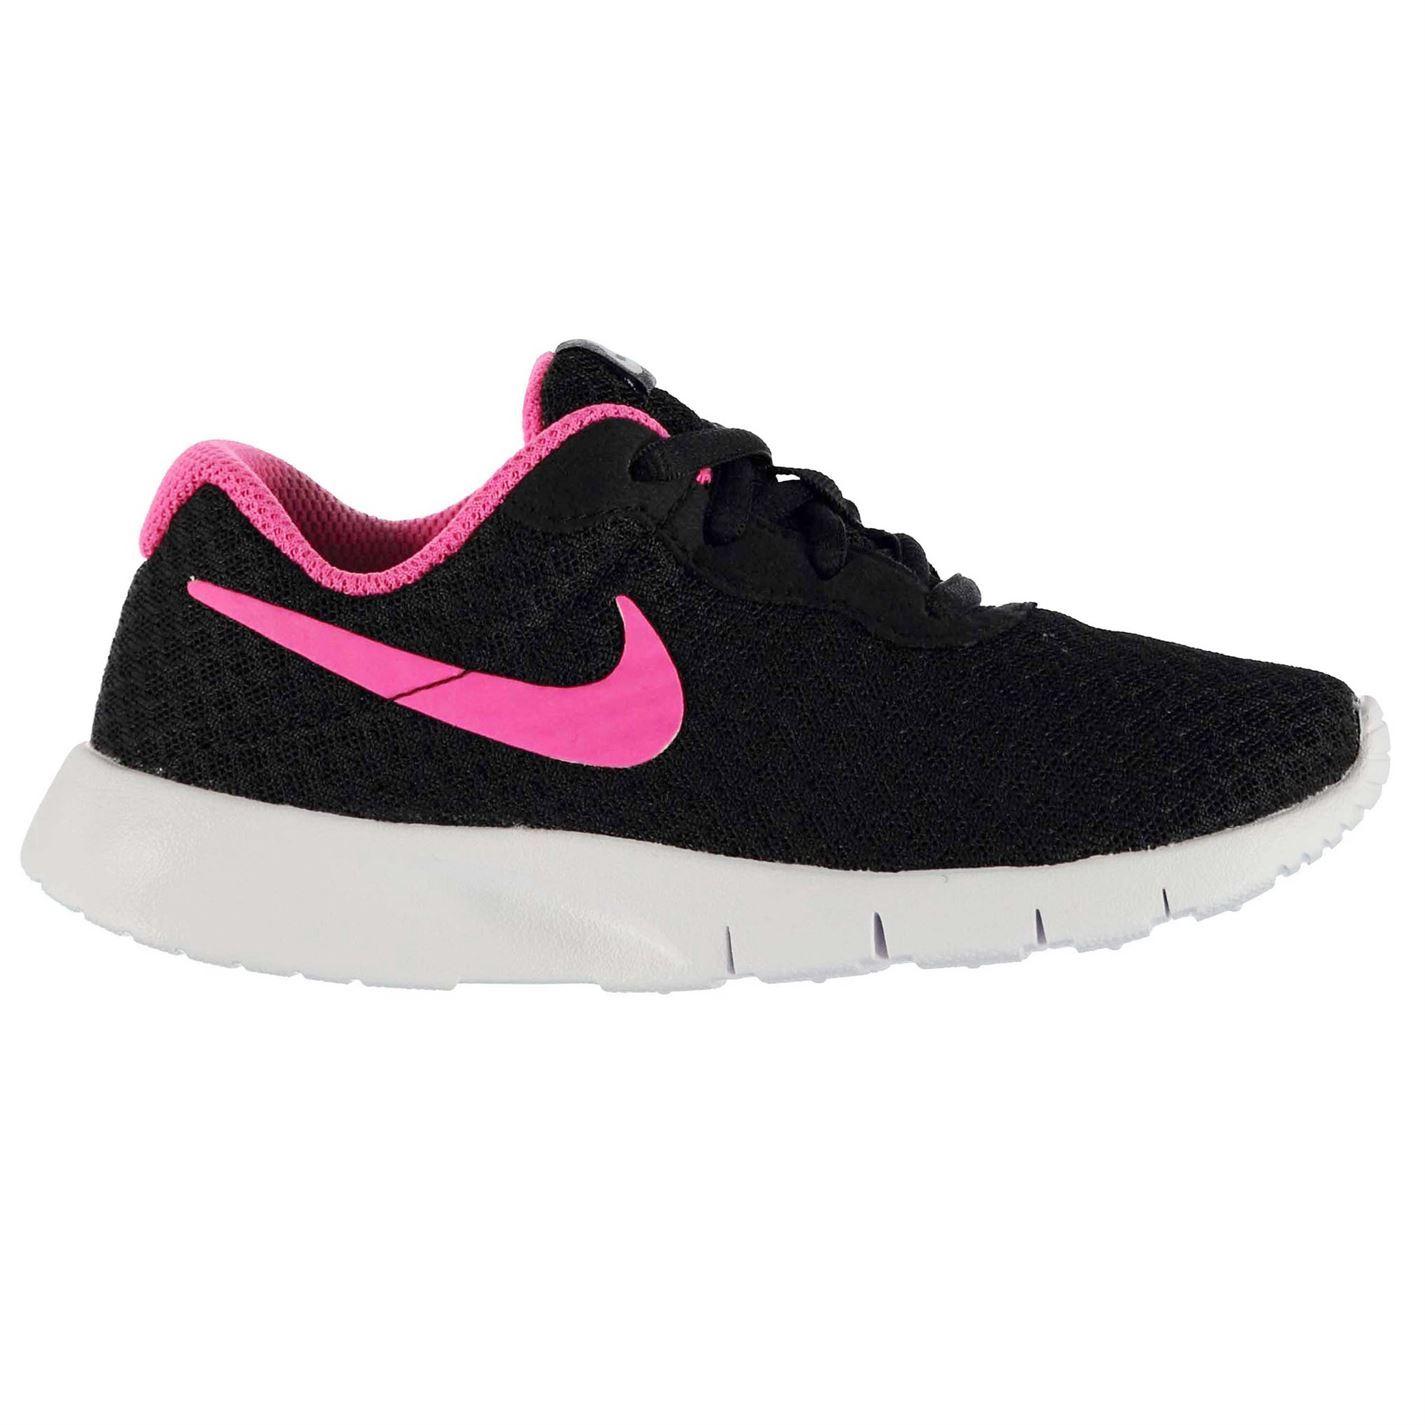 Nike Noir Et Rose Formateurs